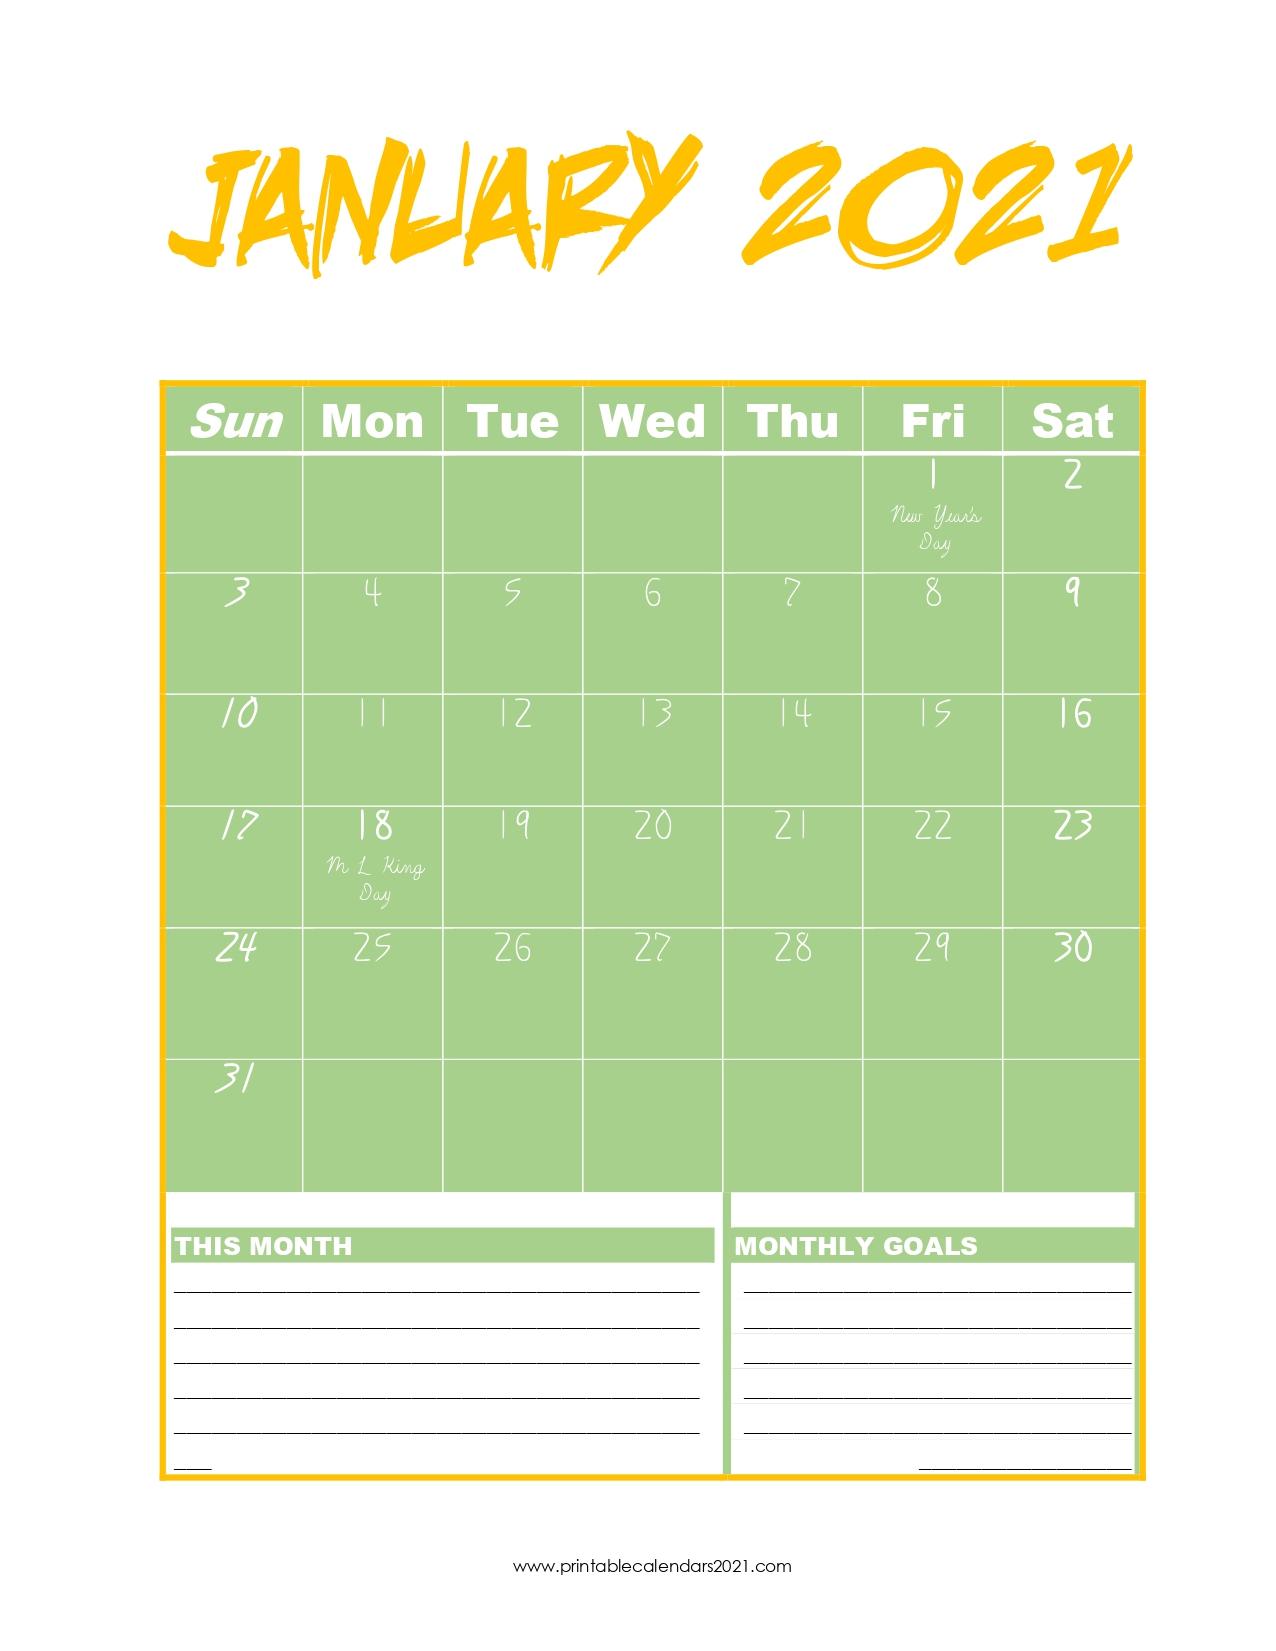 65+ January 2022 Calendar Printable, January 2022 Calendar Throughout View January 2021 Calendar